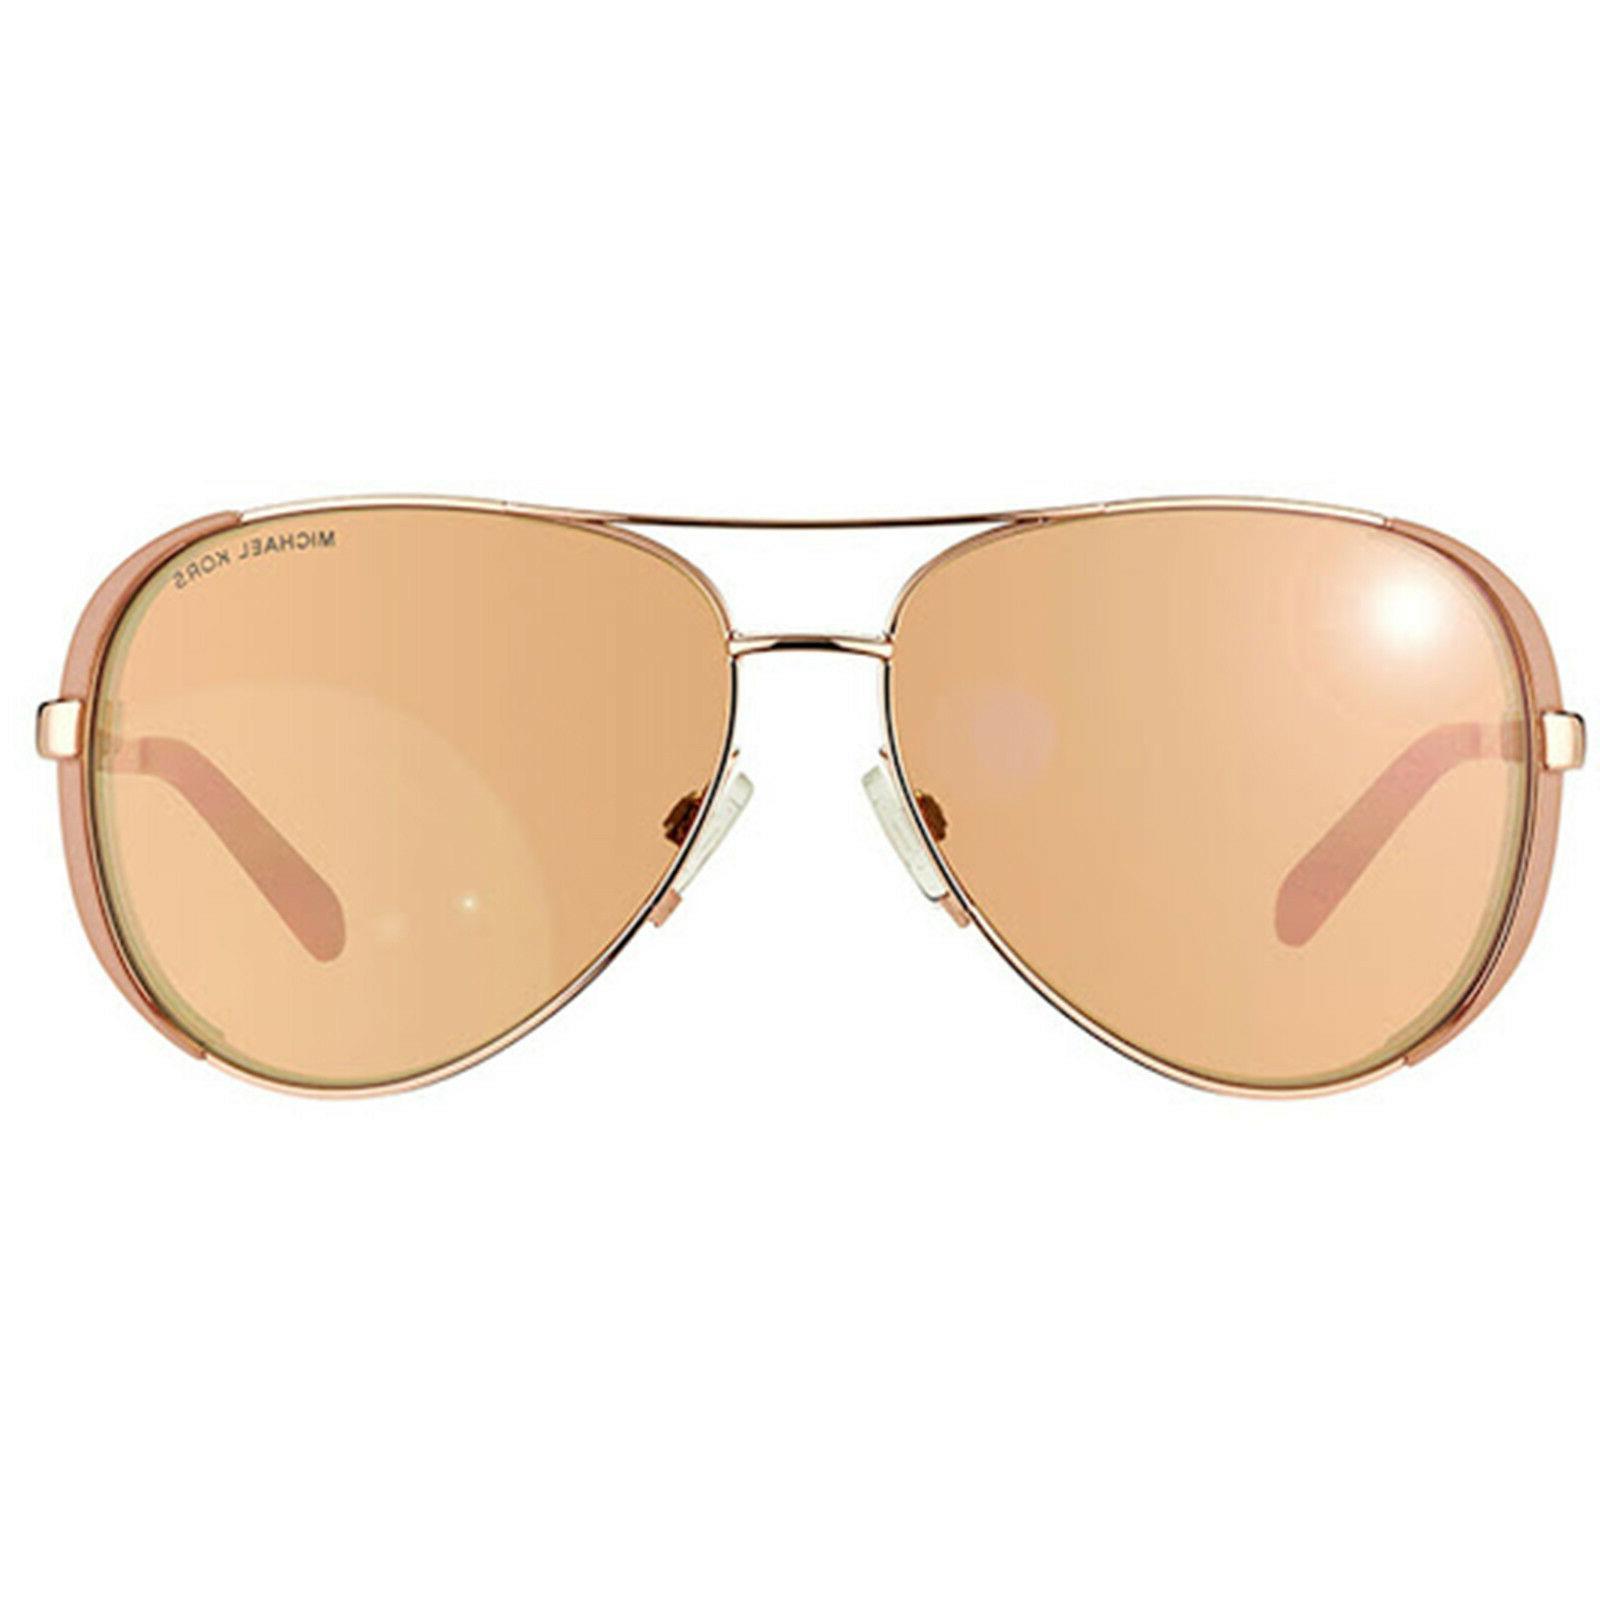 Michael Kors MK5004 Rose Gold Mirror Taupe Aviator Chelsea S